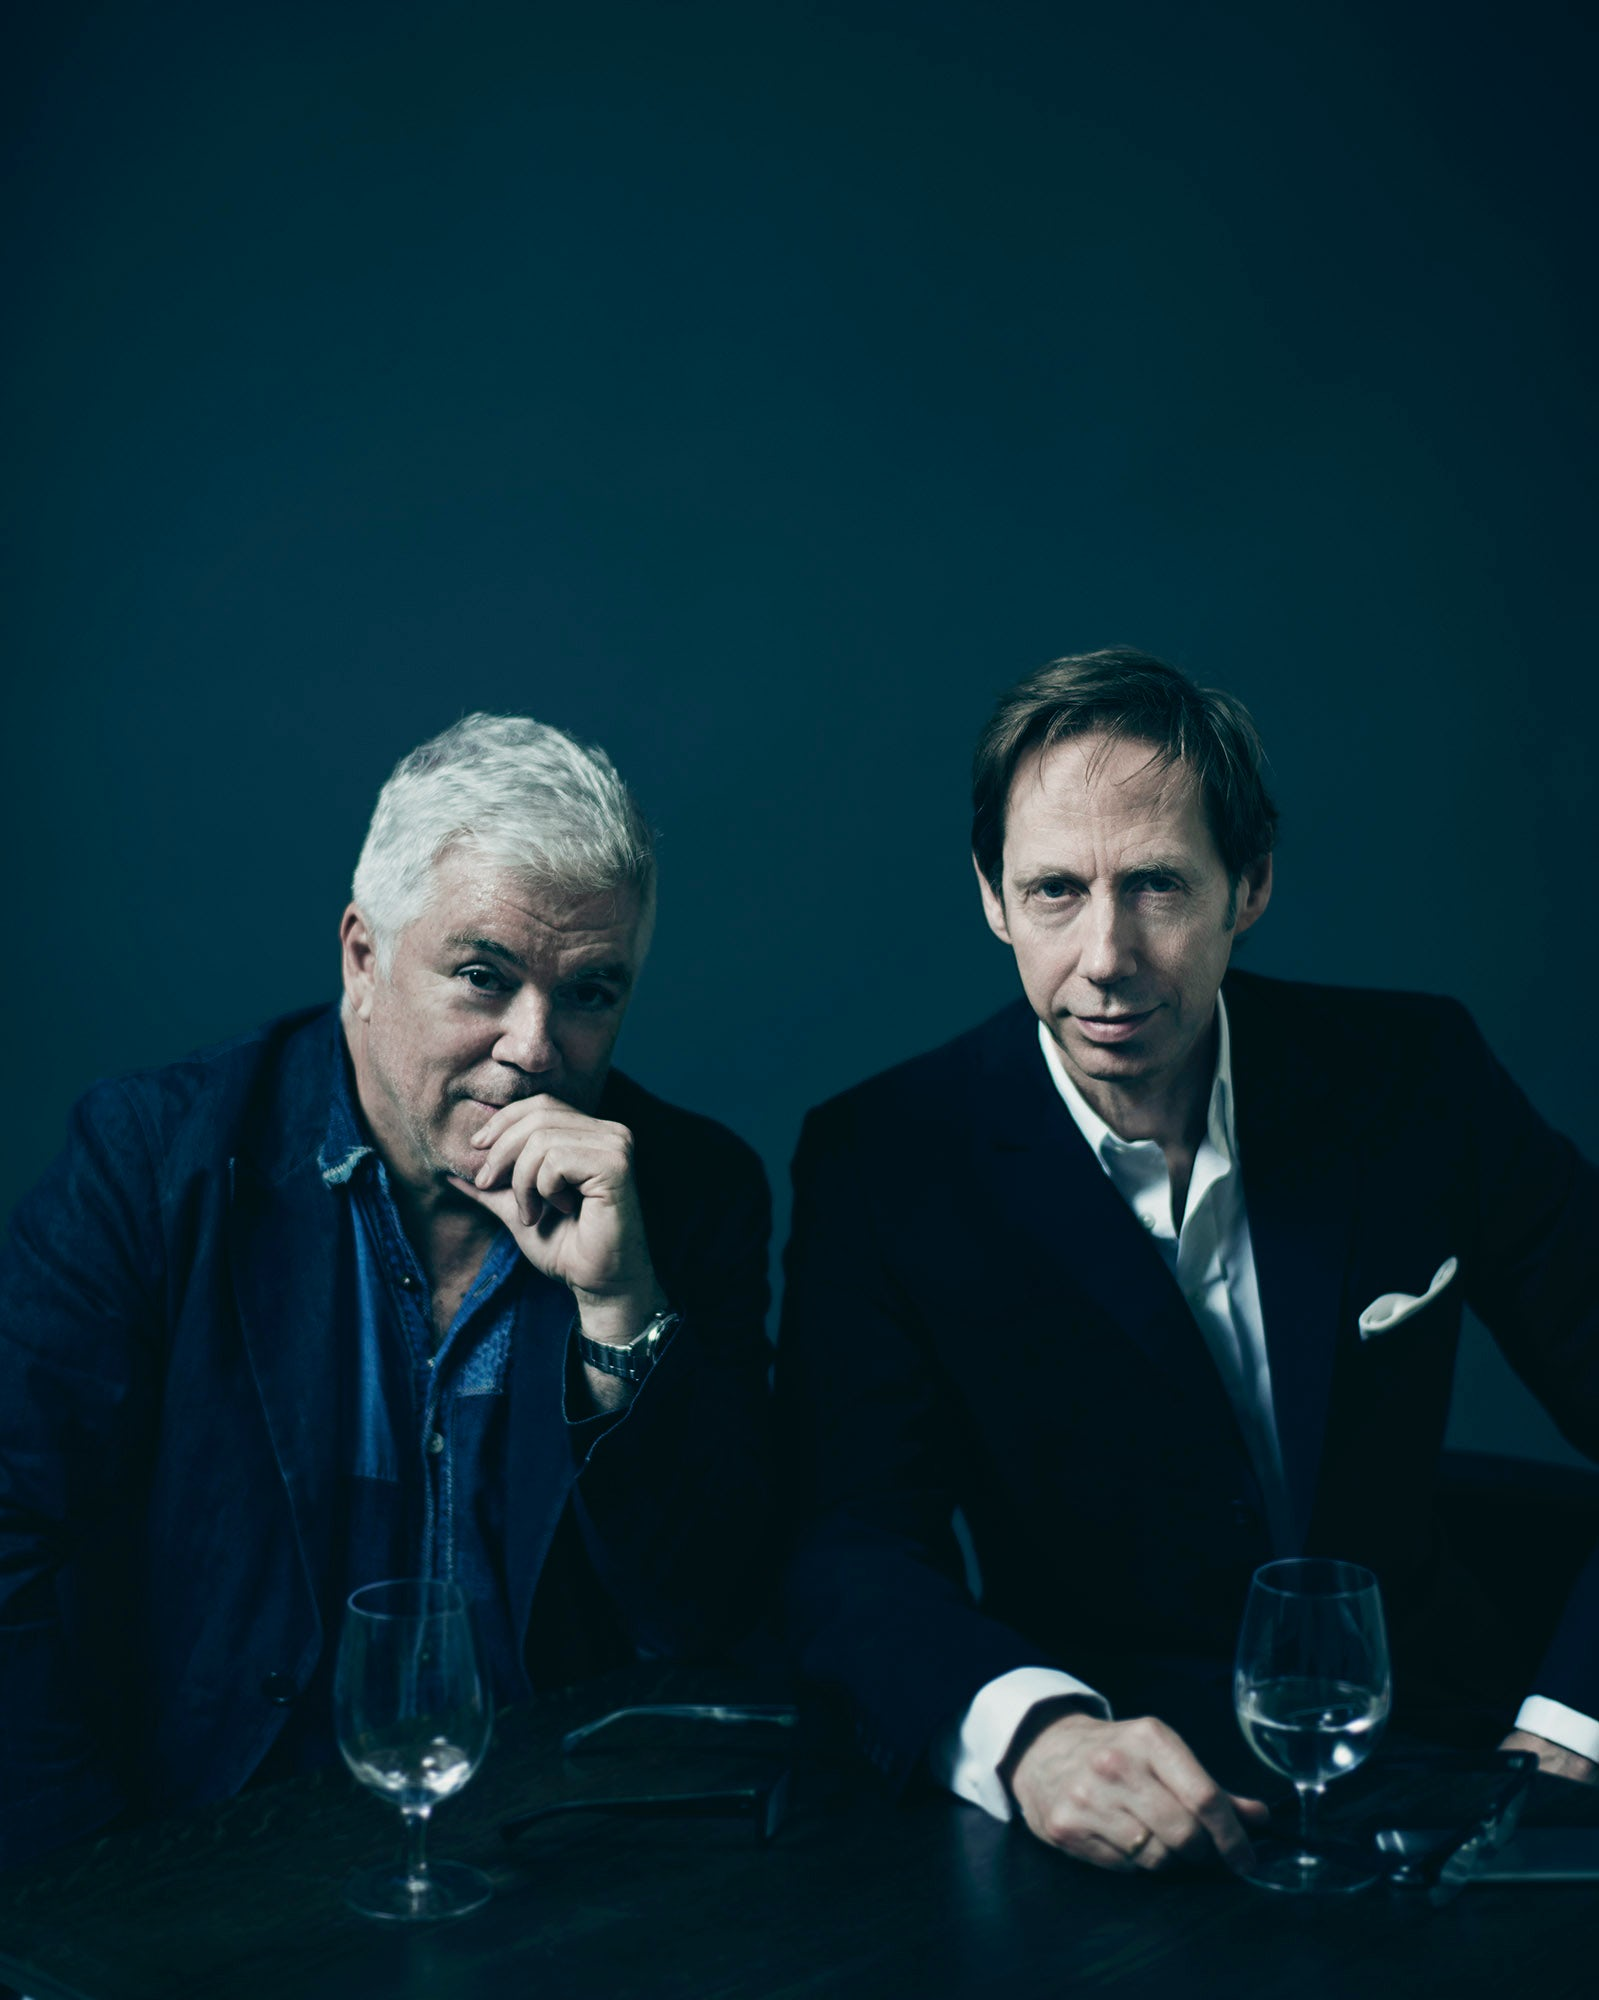 Tim Blanks and Nick Knight | Photo: Benjamin McMahon for BoF